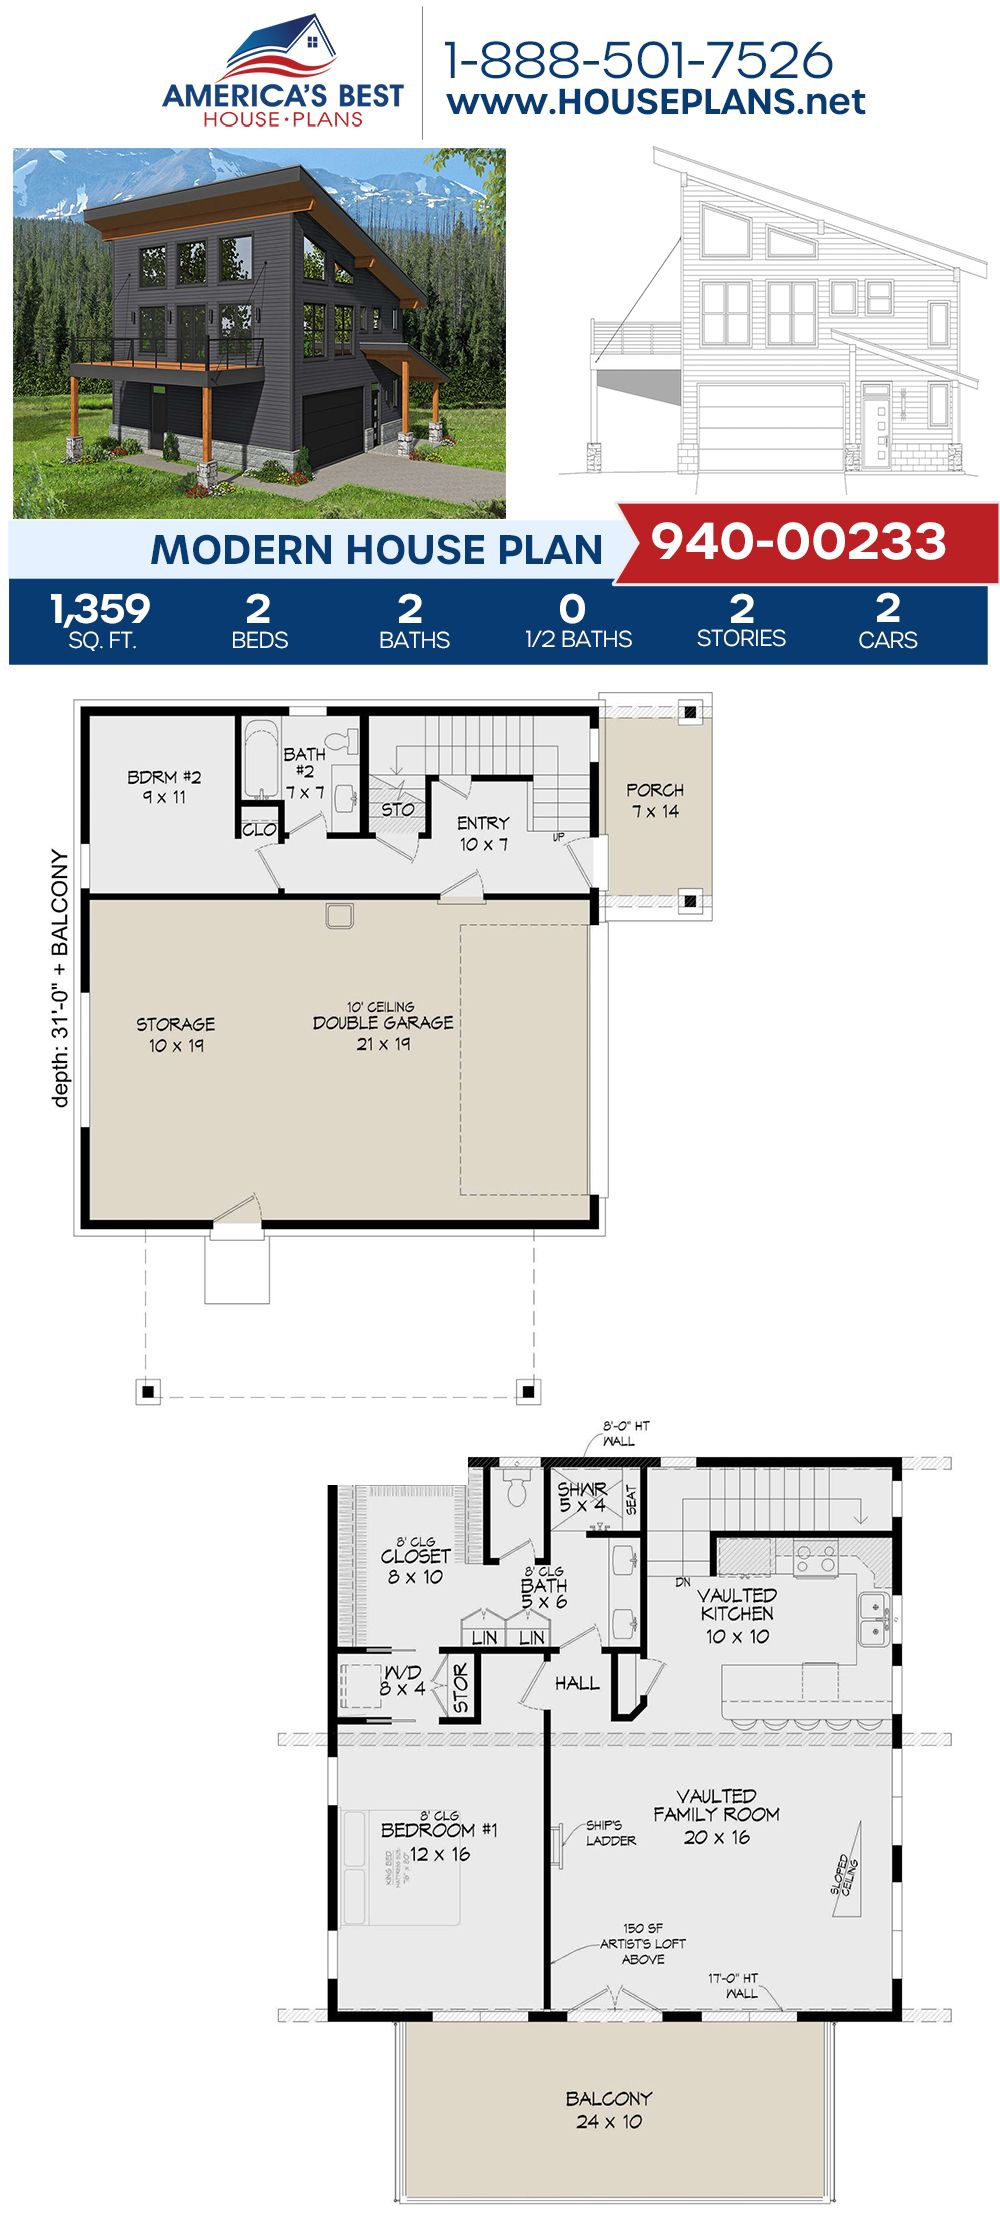 House Plan 940 00233 Modern Plan 1 559 Square Feet 2 Bedrooms 2 Bathrooms Small Modern House Plans Modern House Plan Garage Floor Plans